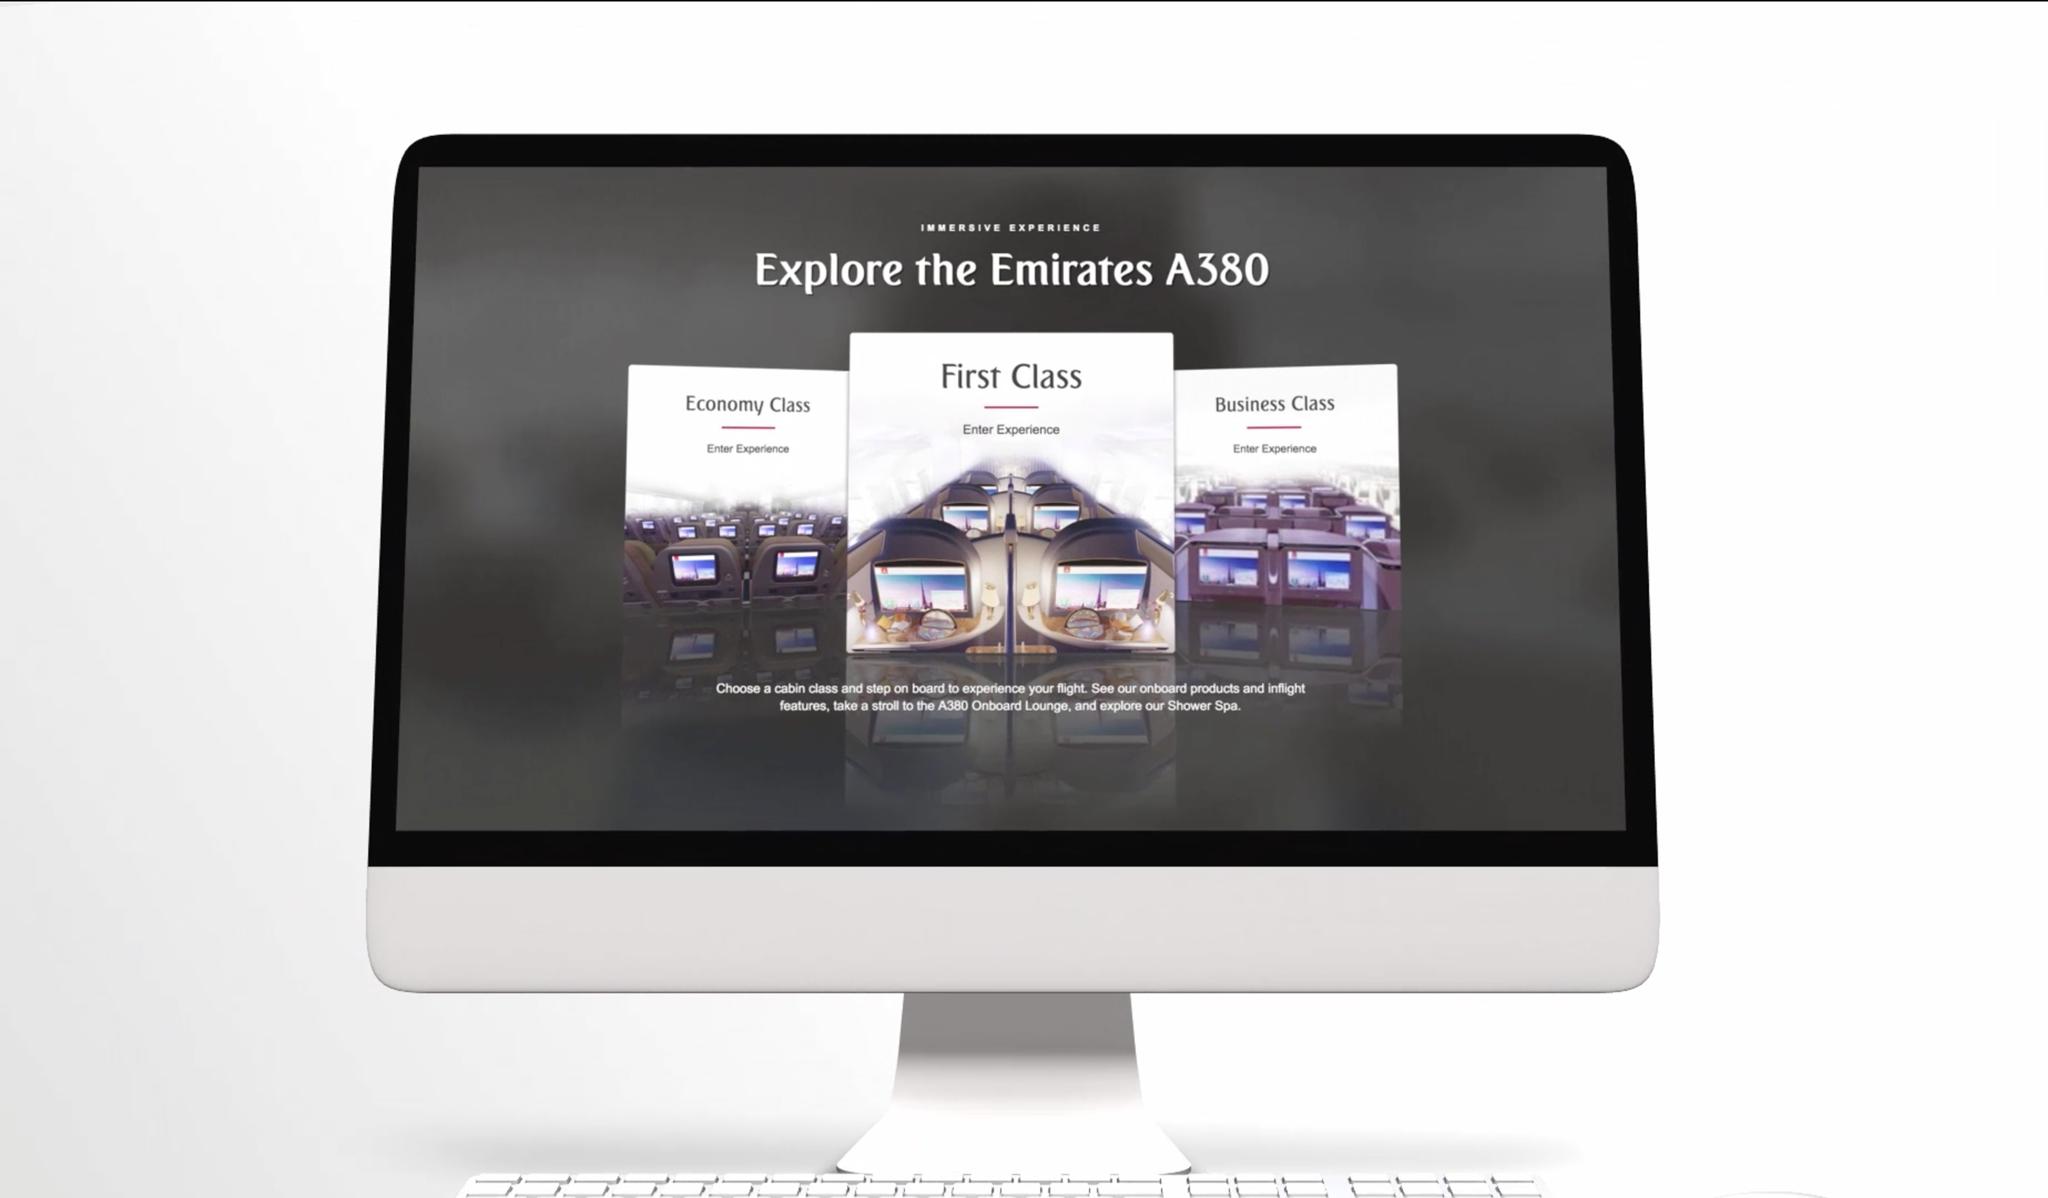 emirates pioneers web virtual reality technology on emirates com rh emirates com Emirates A380 Emirates B777 Tour